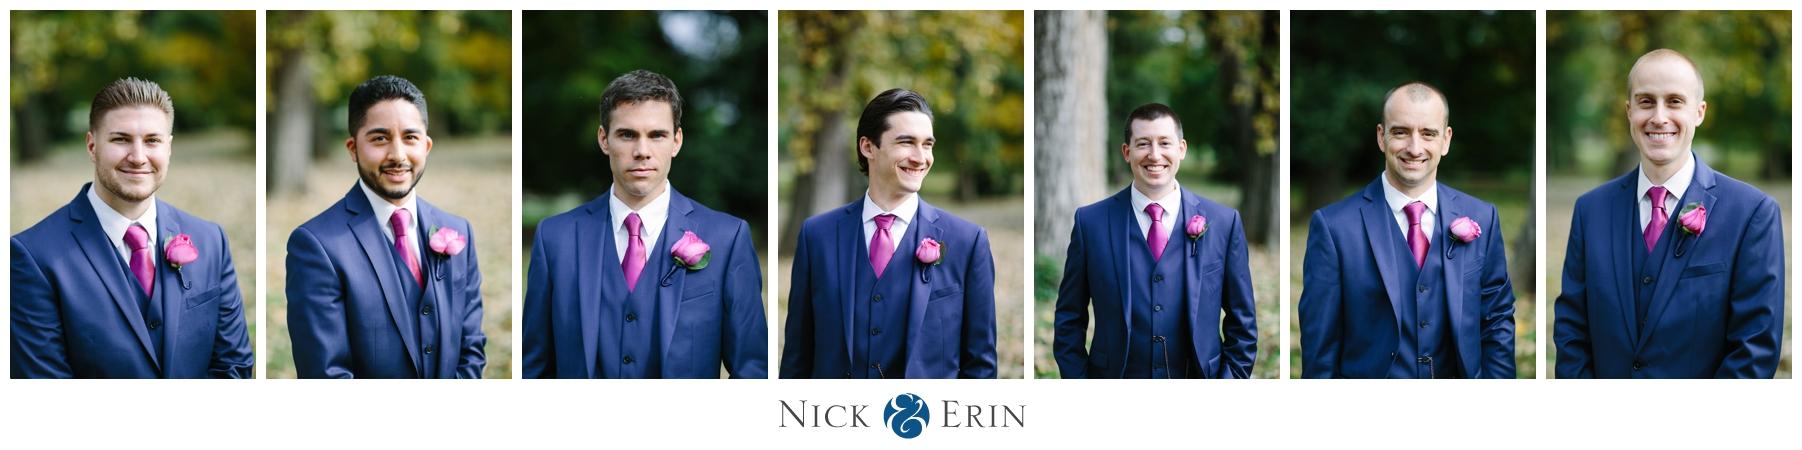 Donner_Photography_Torpedo Factory Wedding_Courtney and Scott_0032b